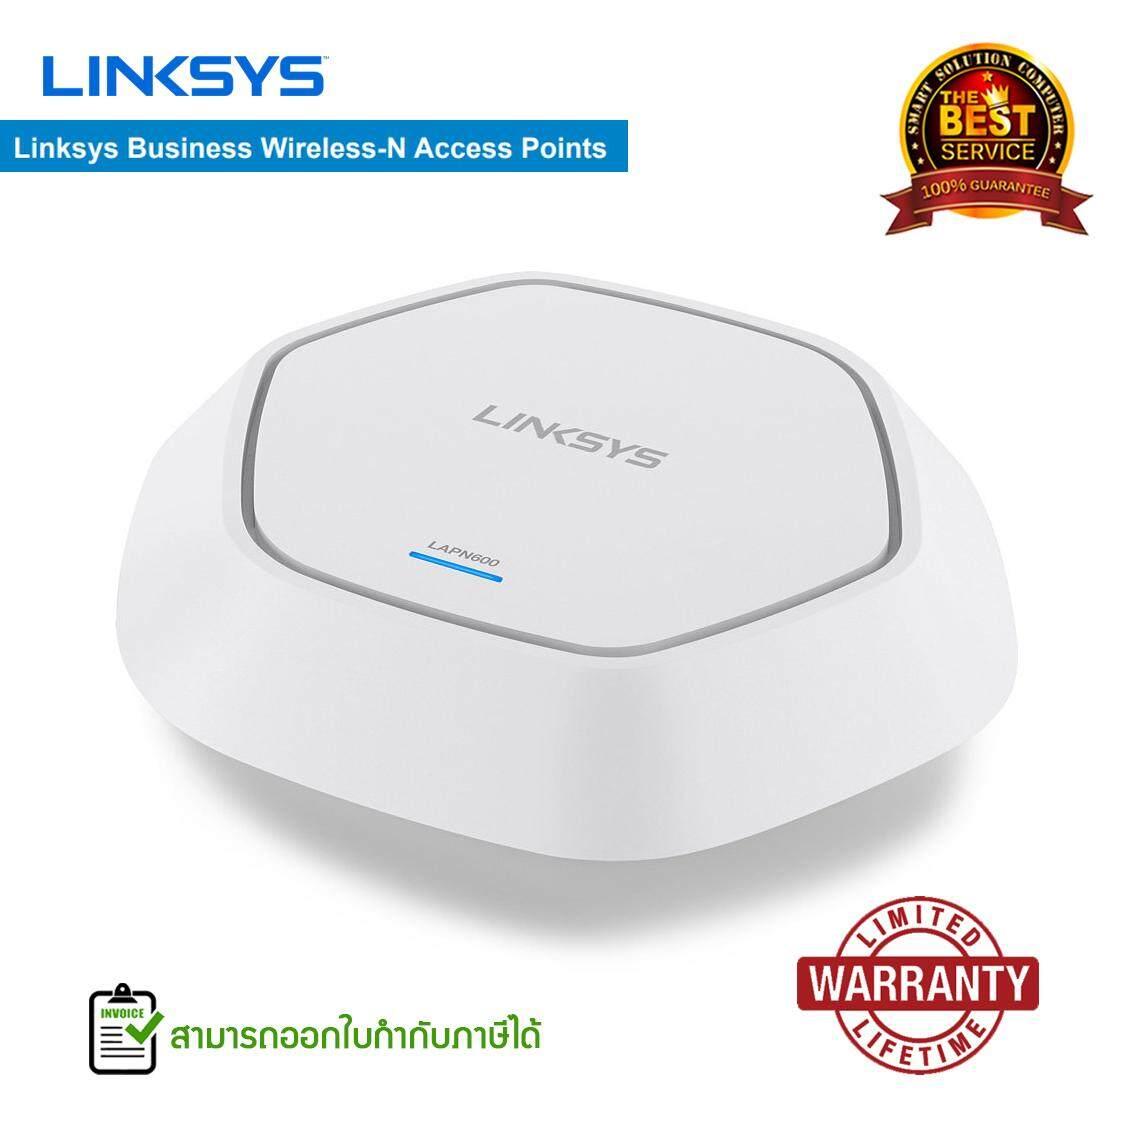 Linksys LAPN600 Business Access Point Wireless Wi-Fi Dual Band 2 4 +